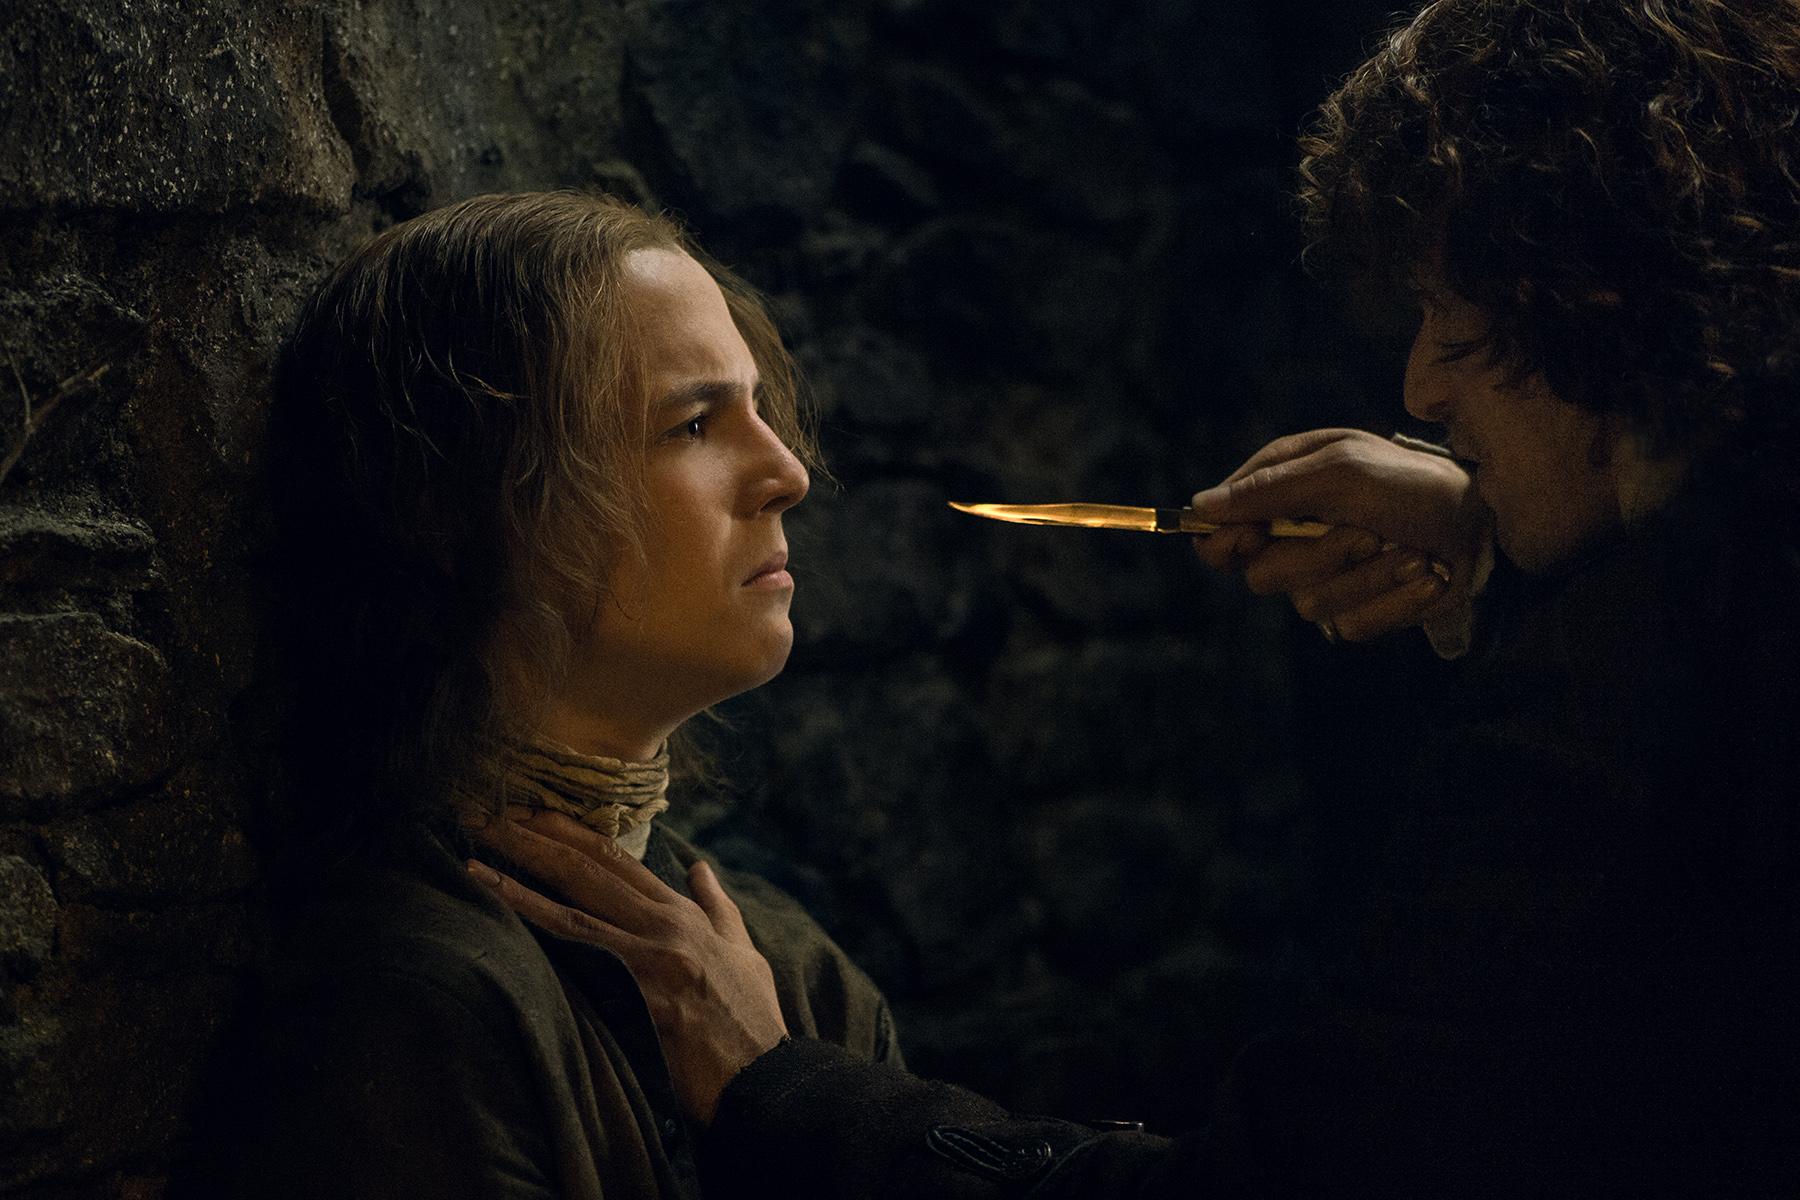 Oscar Kennedy as William Grey and Sam Heughan as Jamie Fraser in 'Outlander' Season 2, Episode 9 — 'Je Suis Prest'